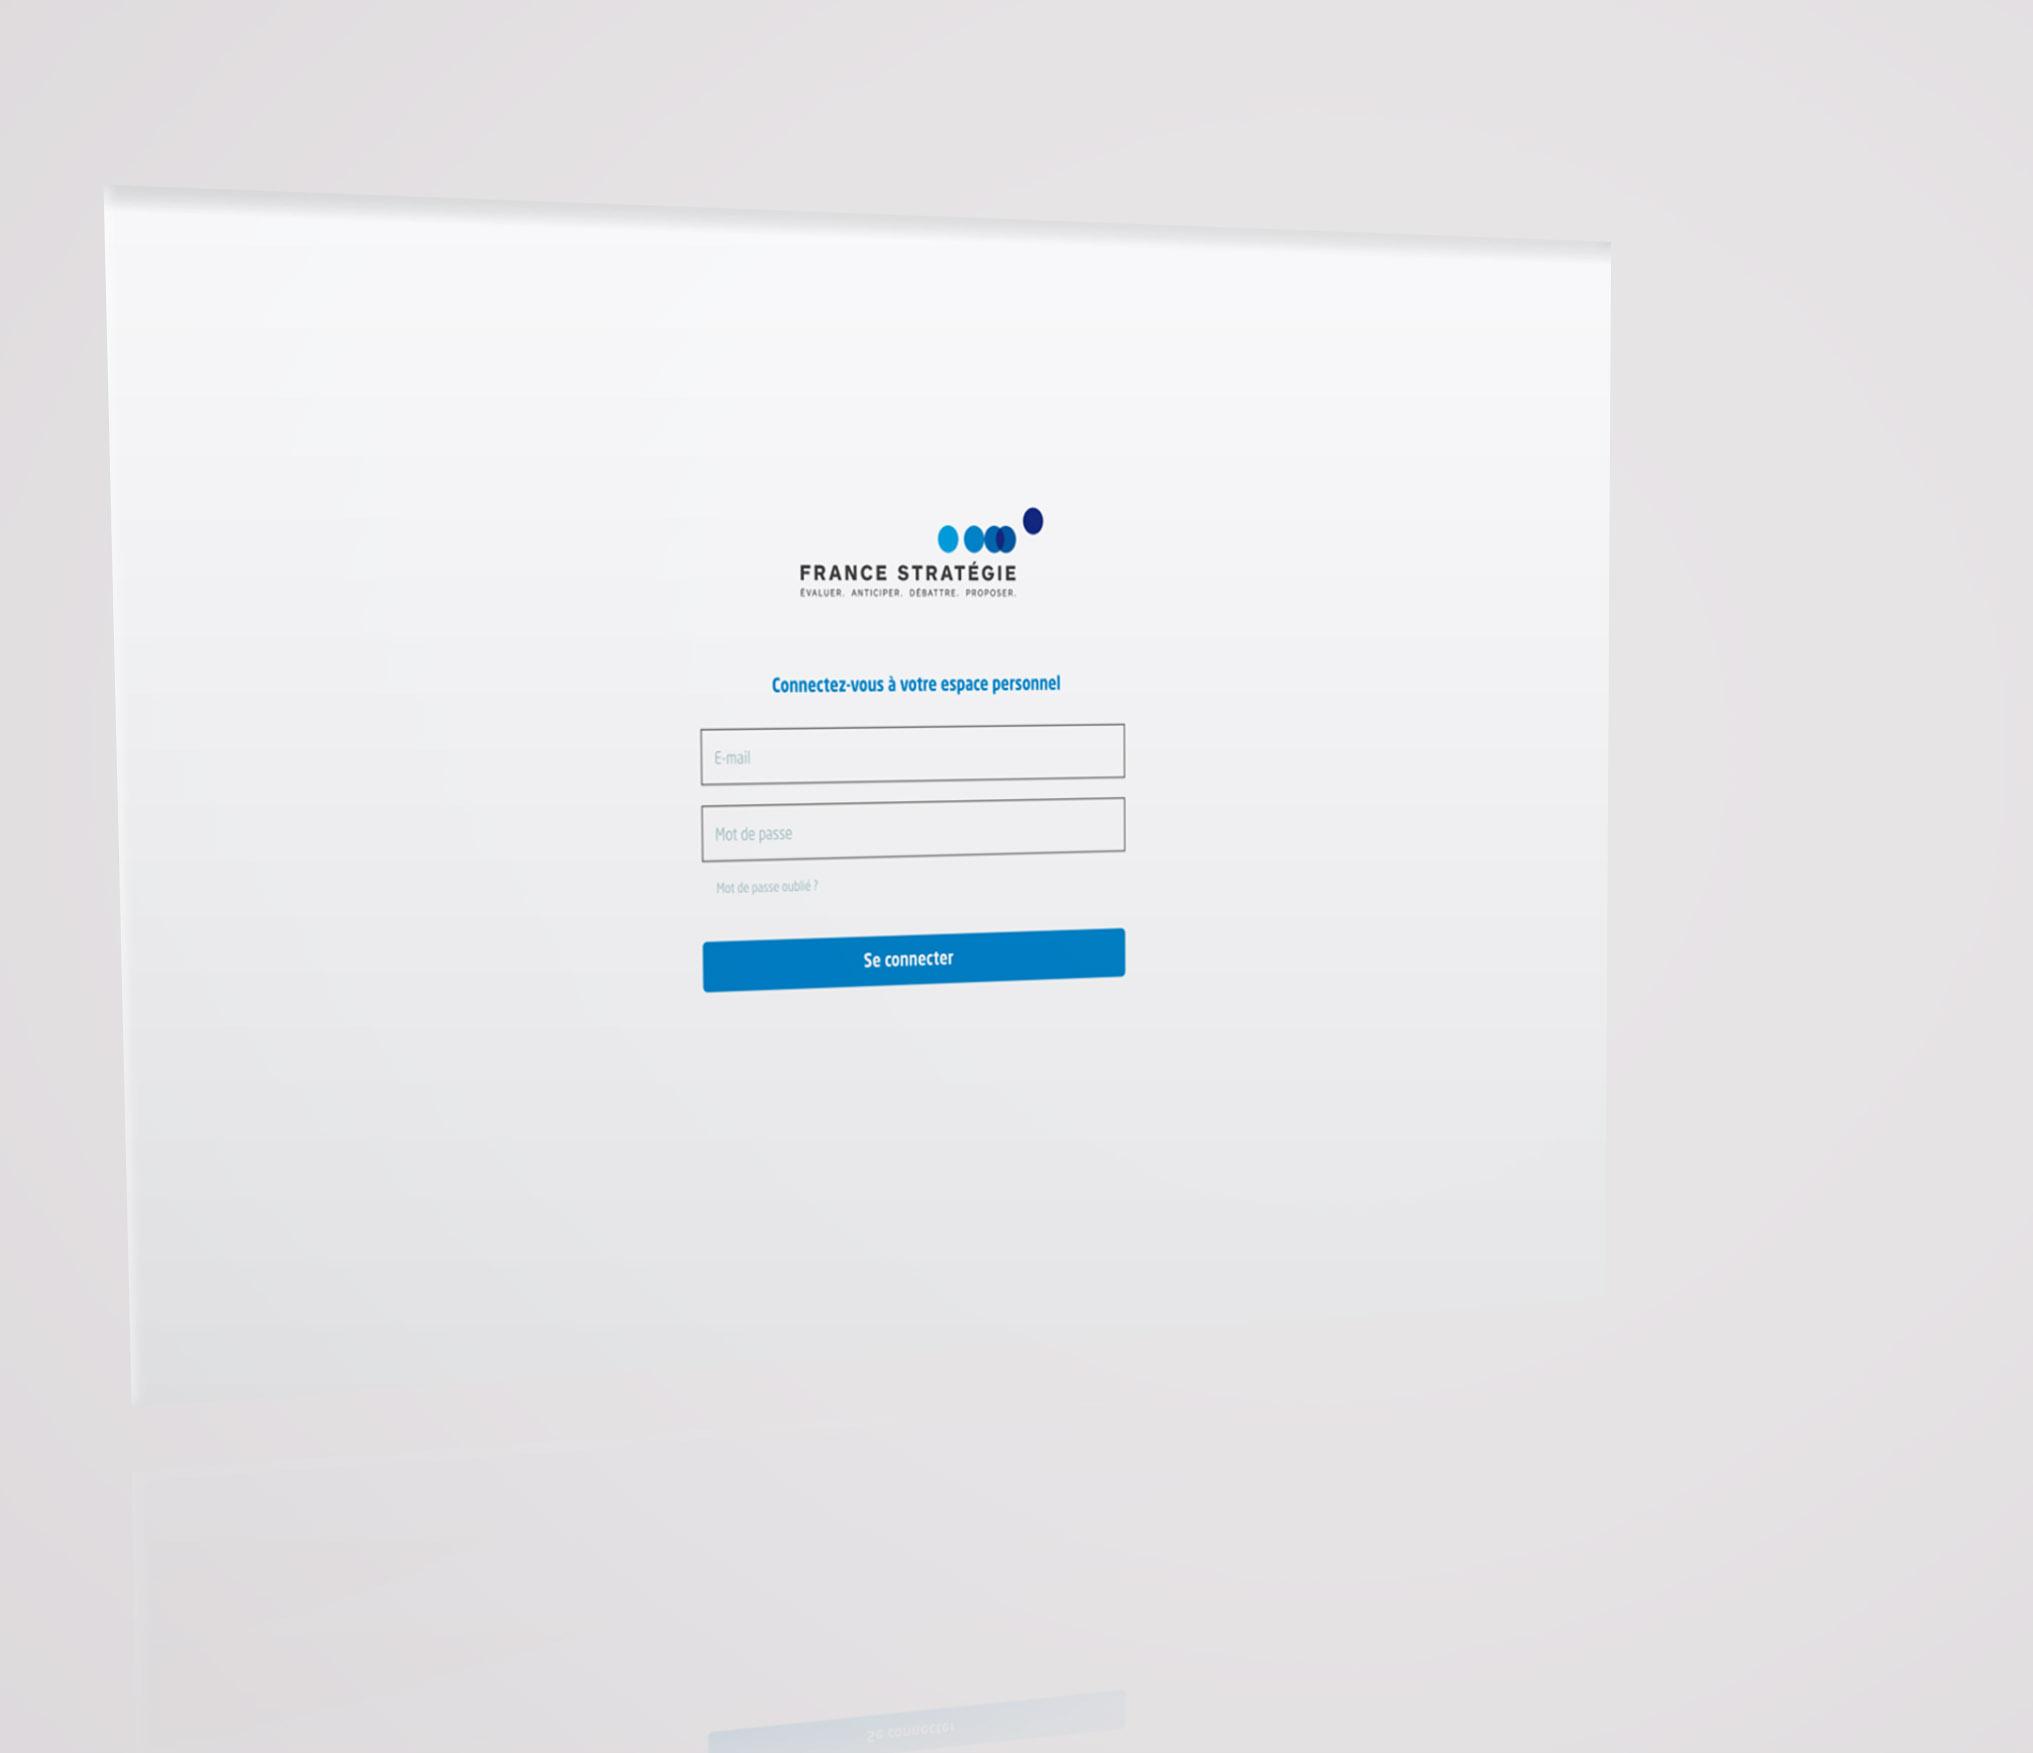 FRANCE STRATEGIE - Web Application